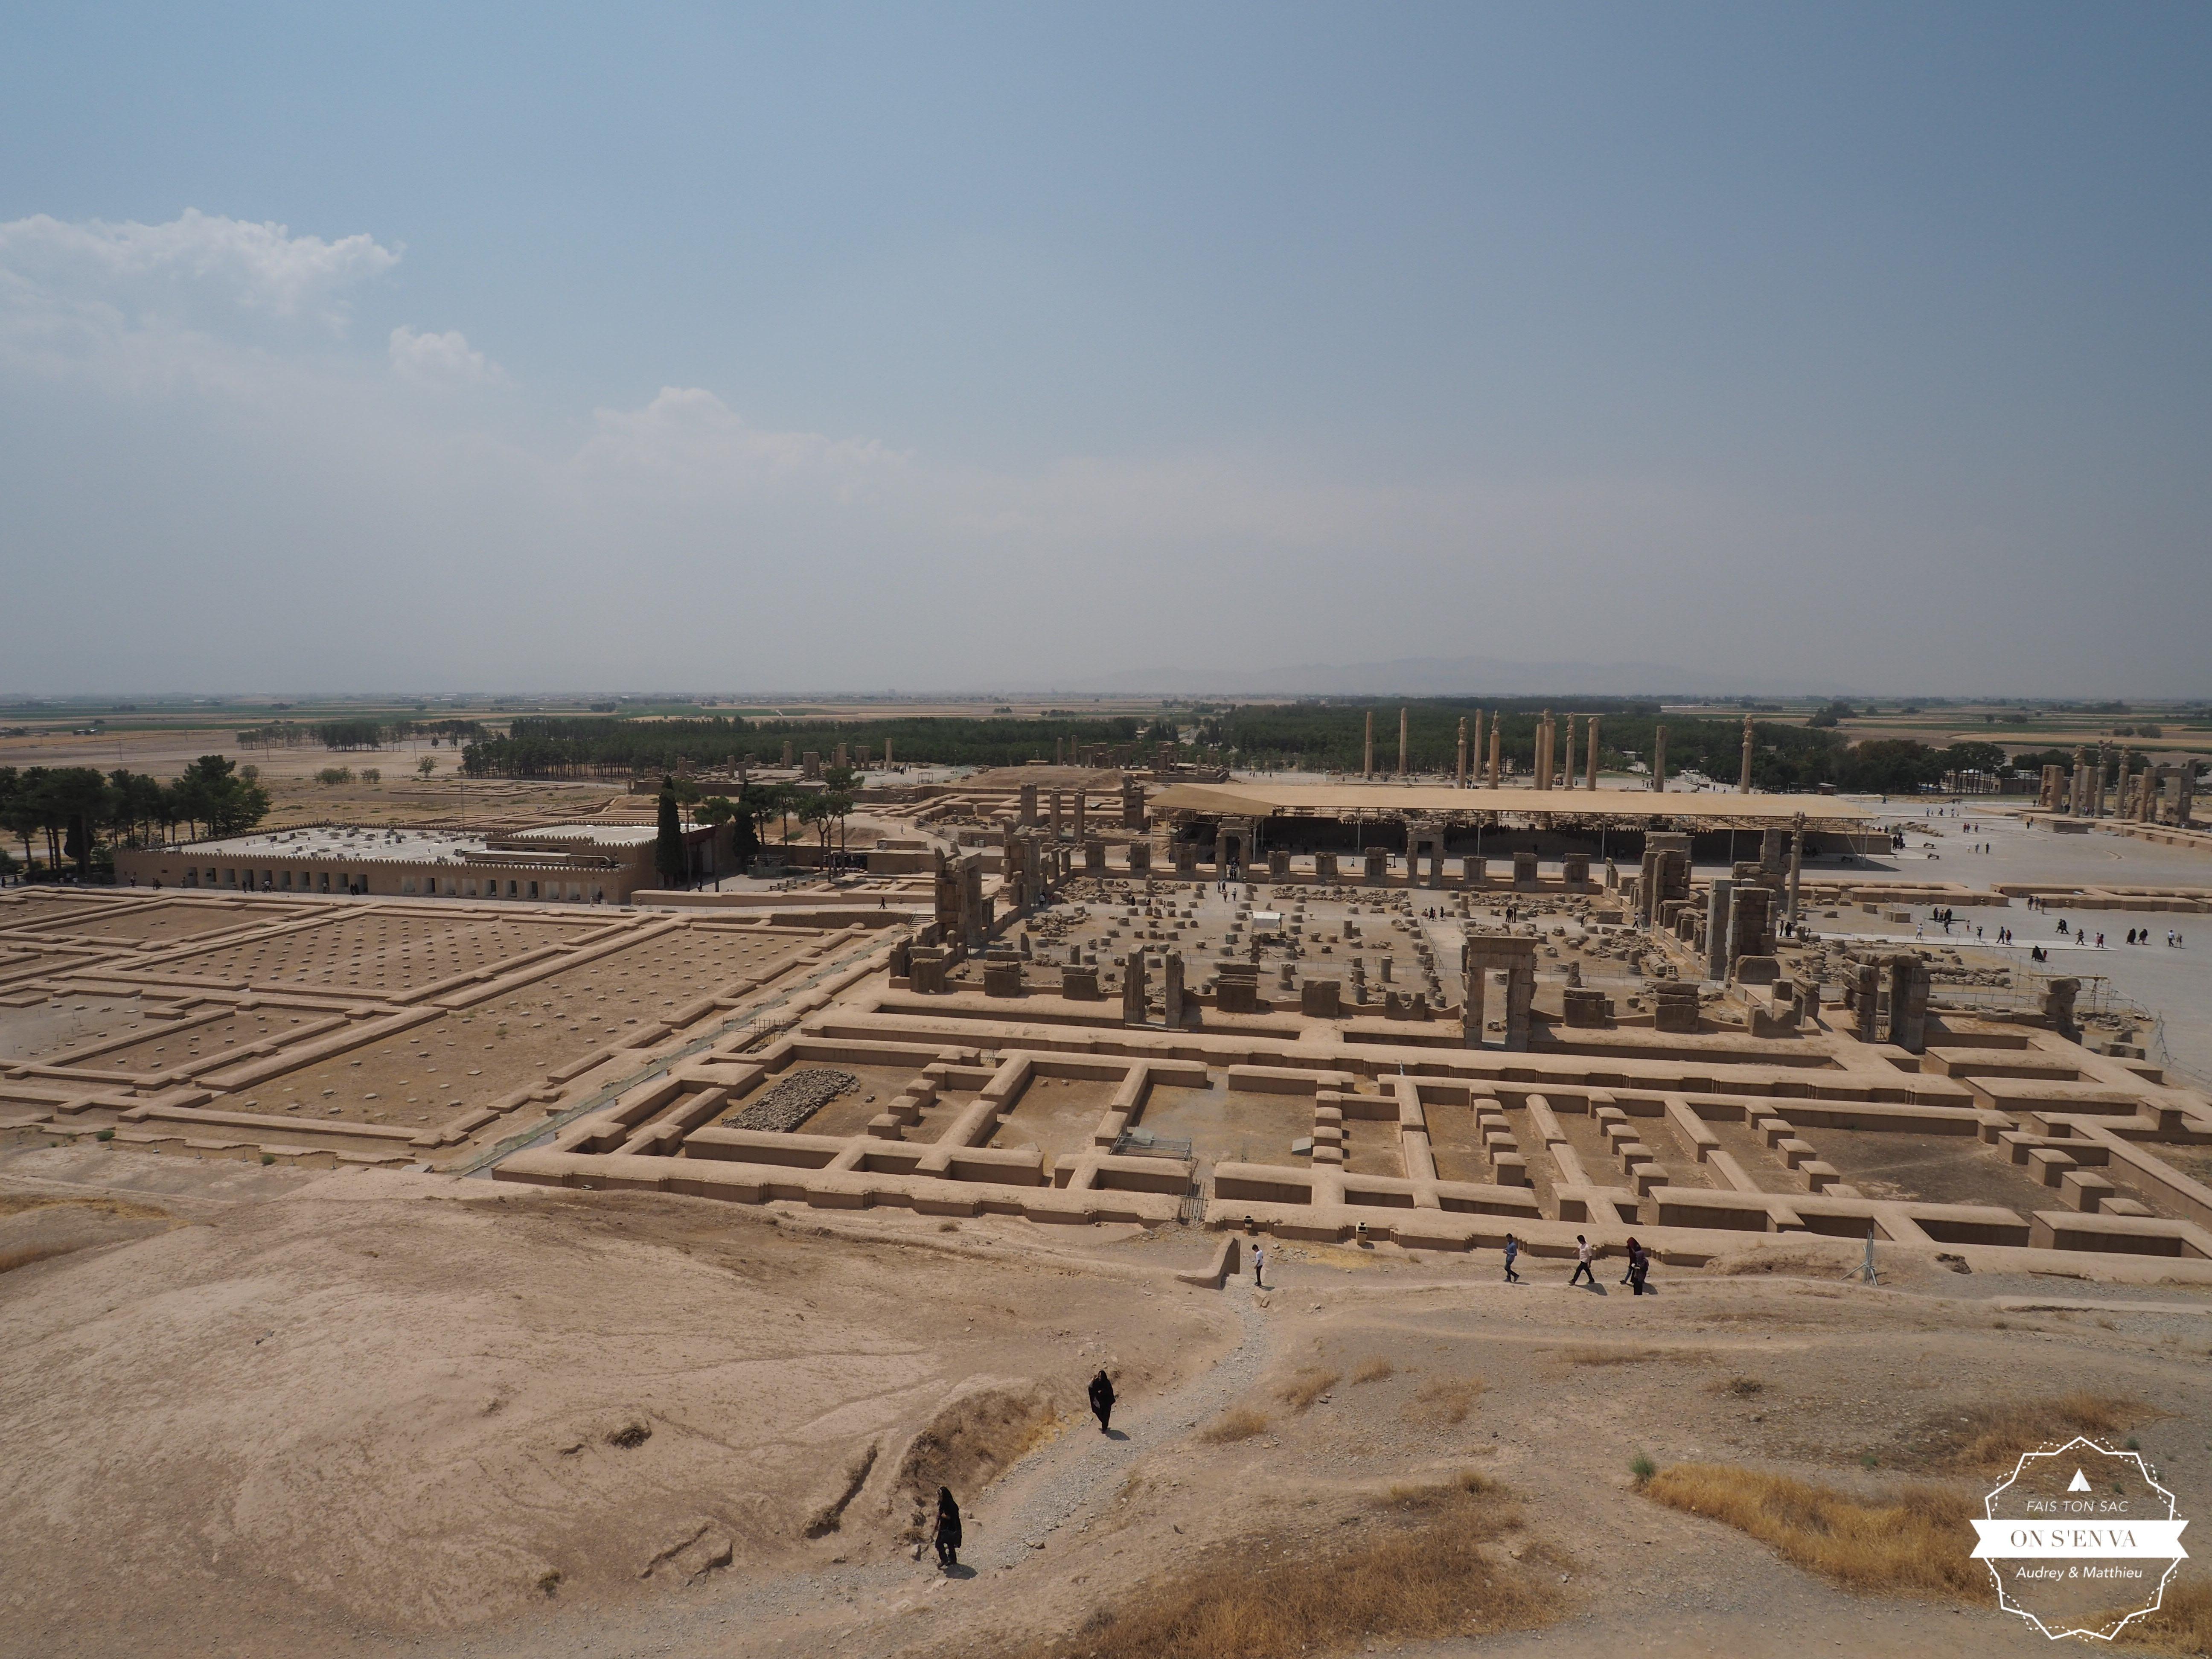 Vue de Persepolis